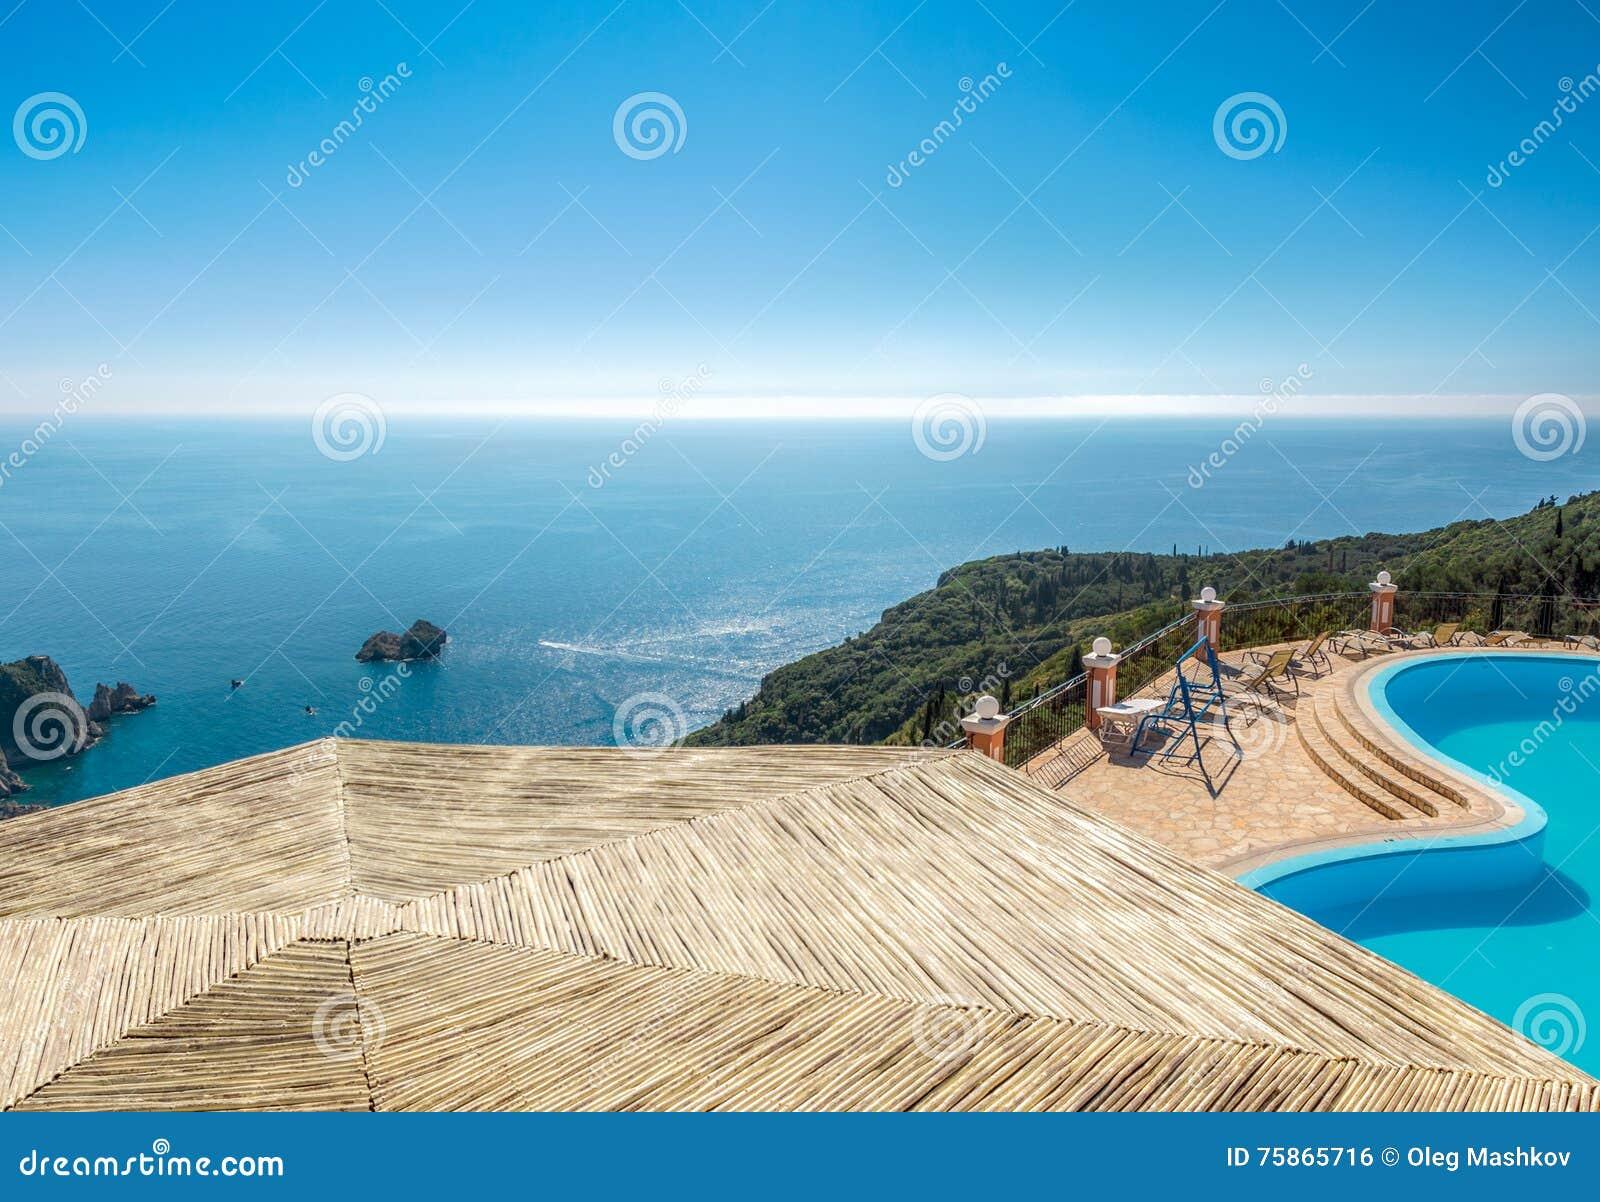 Beautiful summer resort landscape